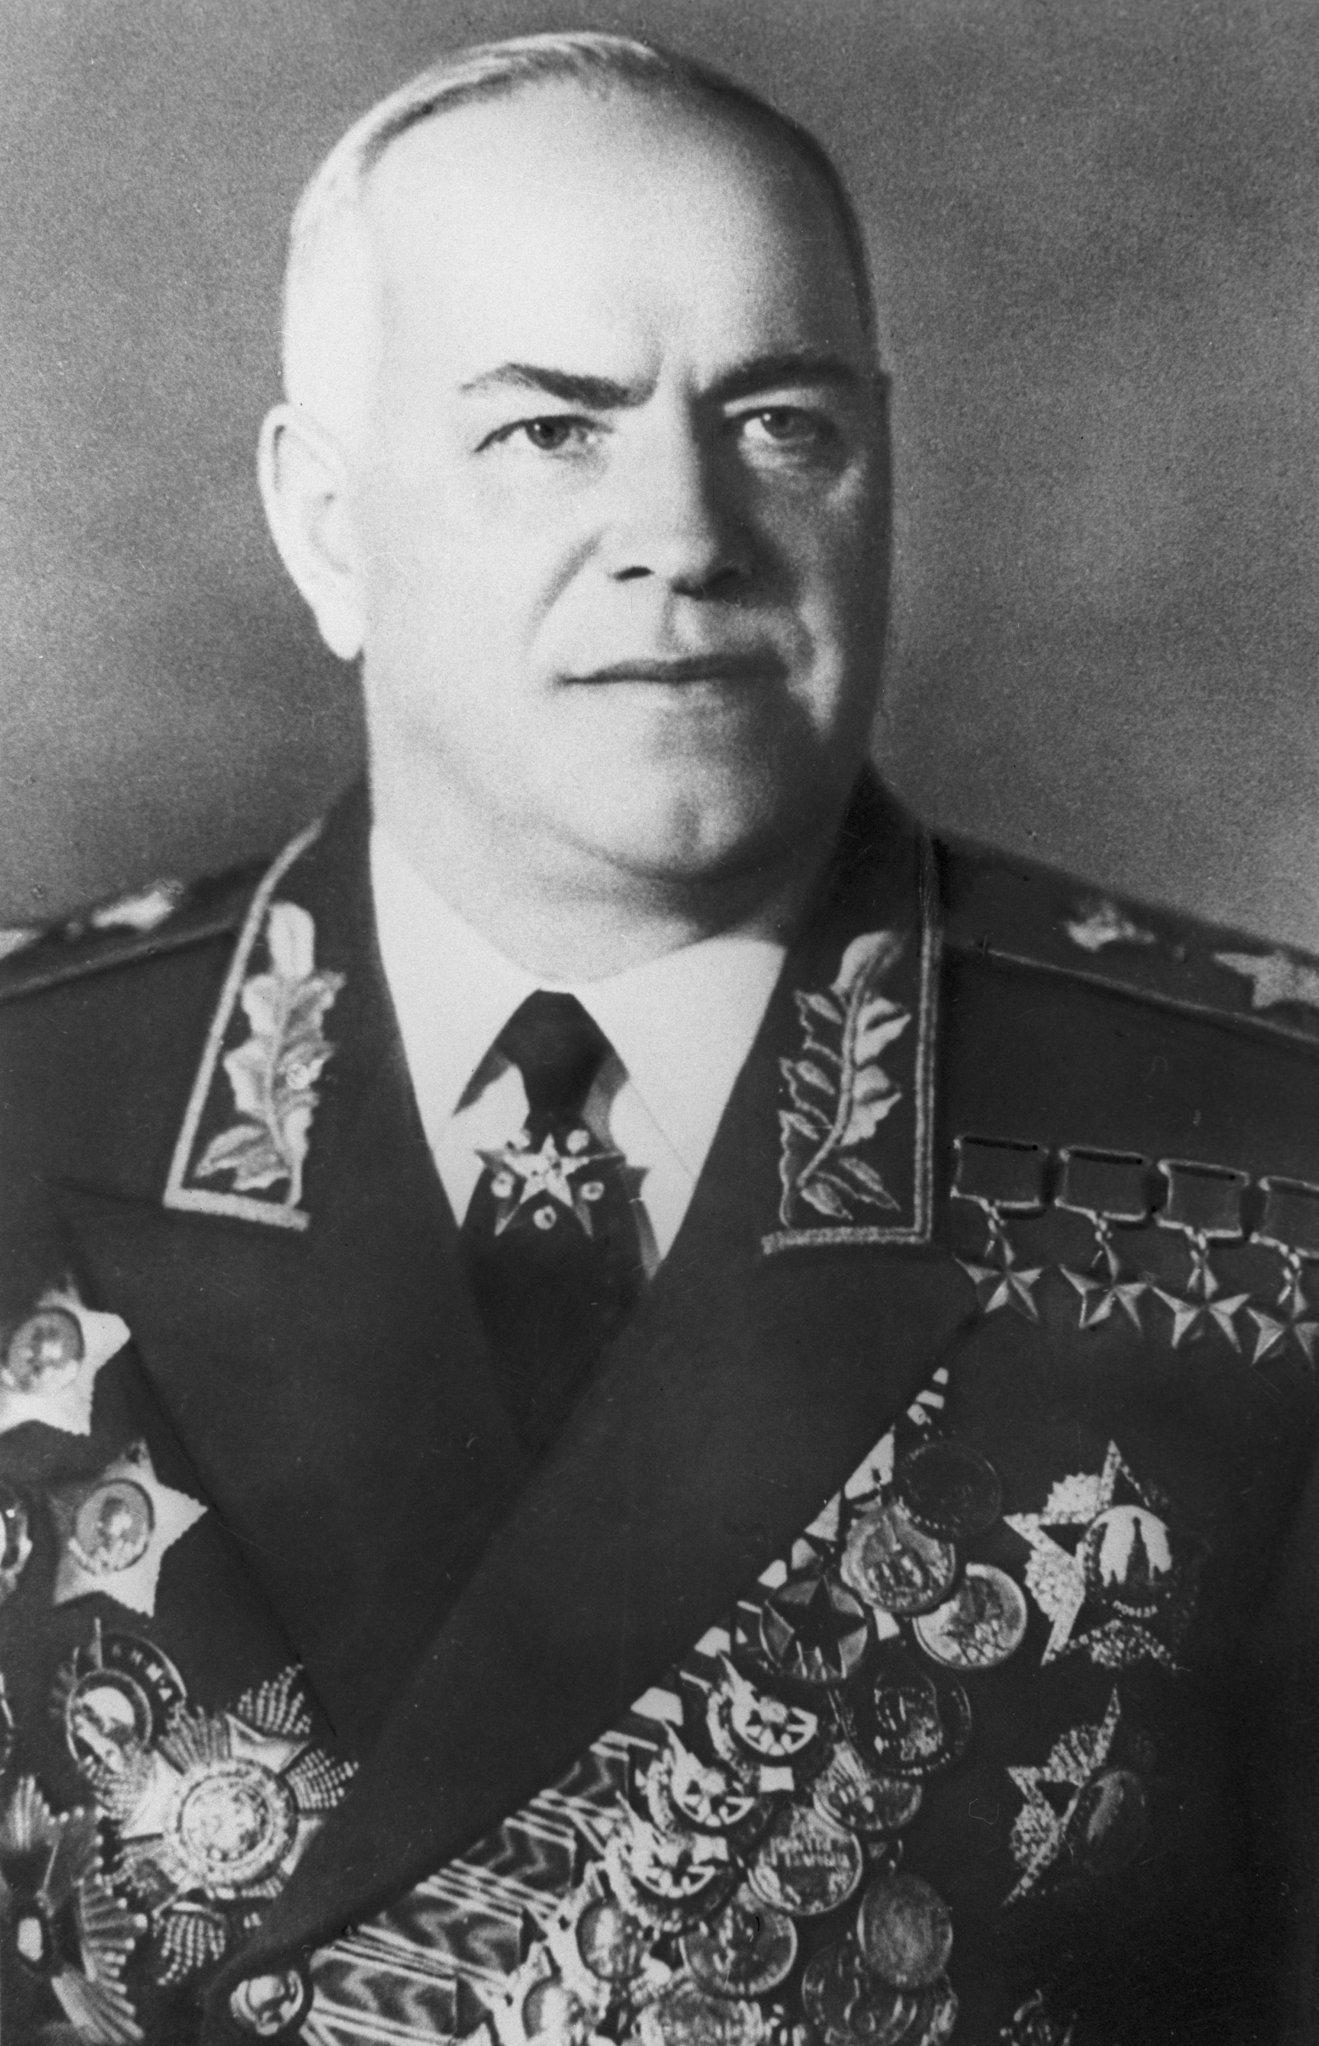 Mariscal Gueorgui Konstantínovich Zhúkov